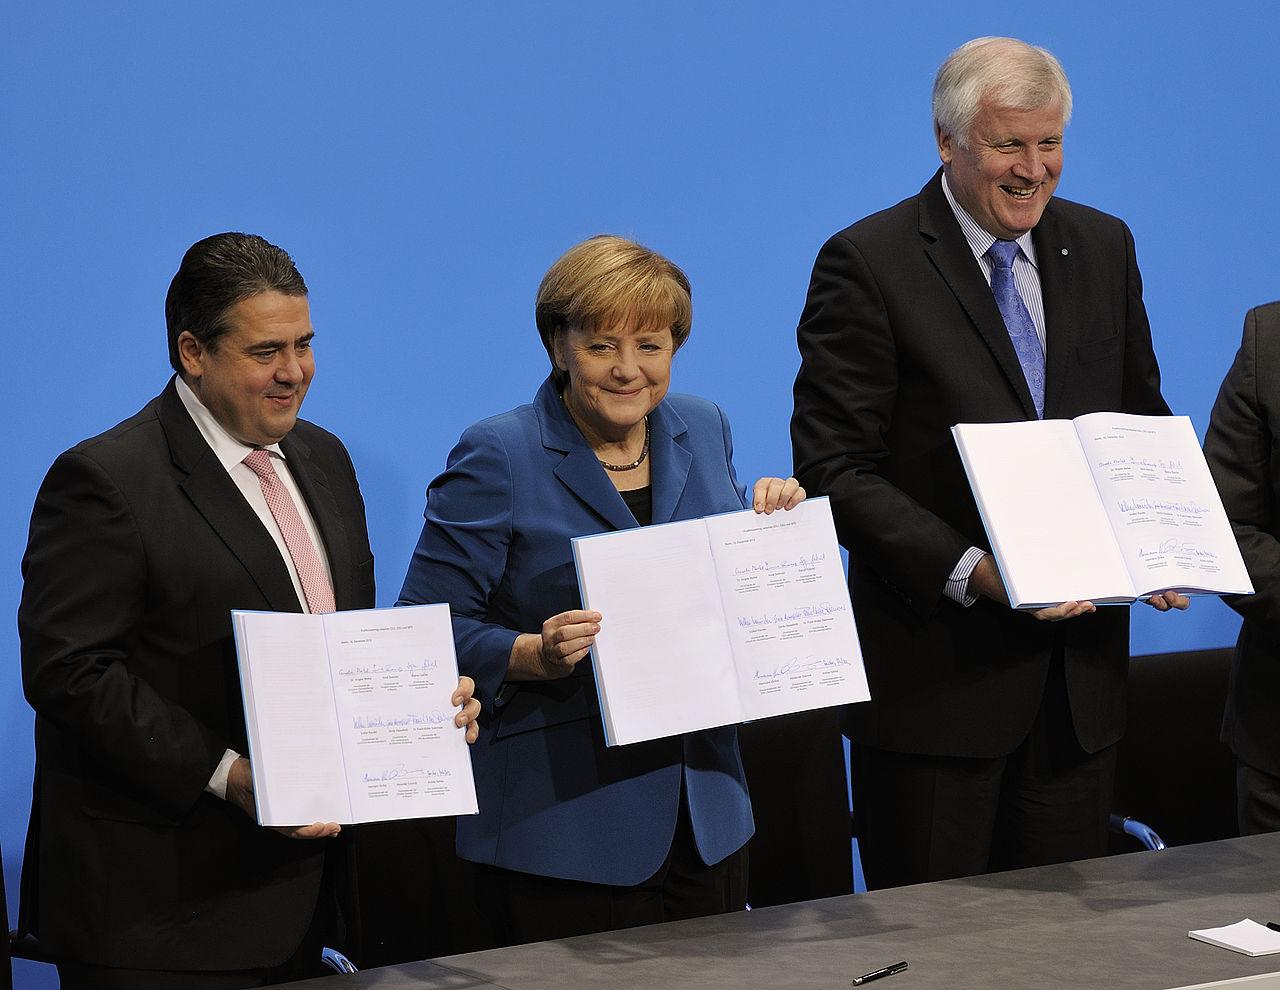 Unterschrift des Koalitionsvertrages der 18. Wahlperiode des Bundestages am 16. Dezember 2013 im Paul-Löbe-Haus